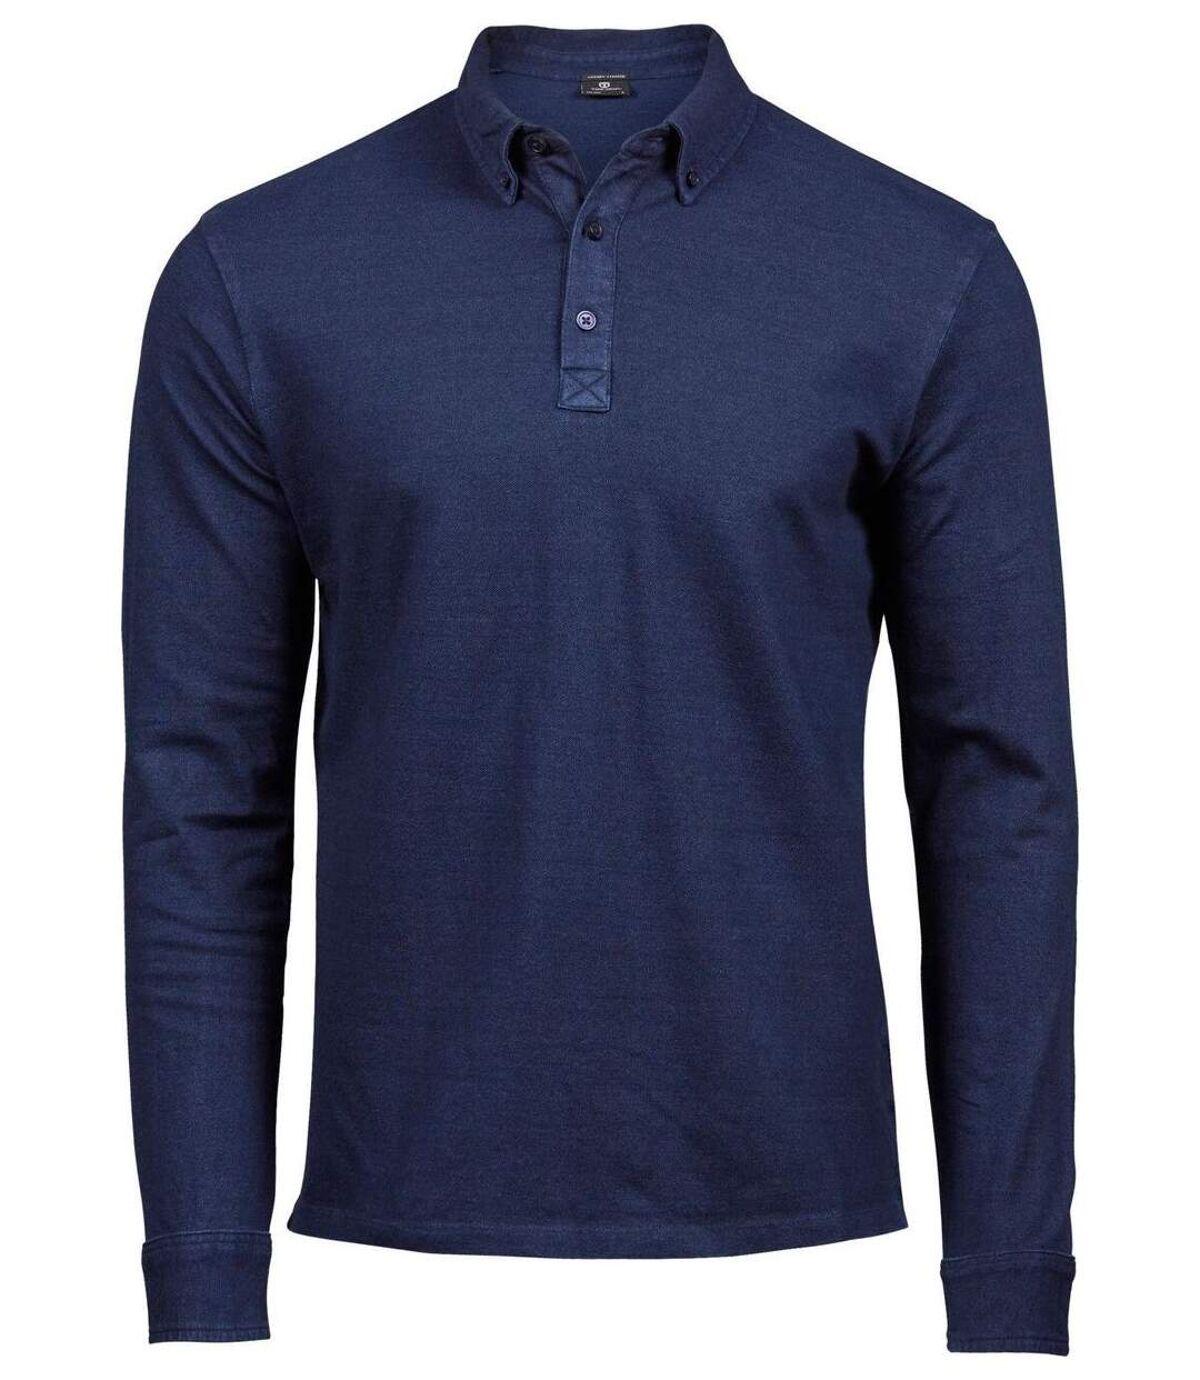 Polo homme luxury stretch - 1412 - bleu denim - manches longues